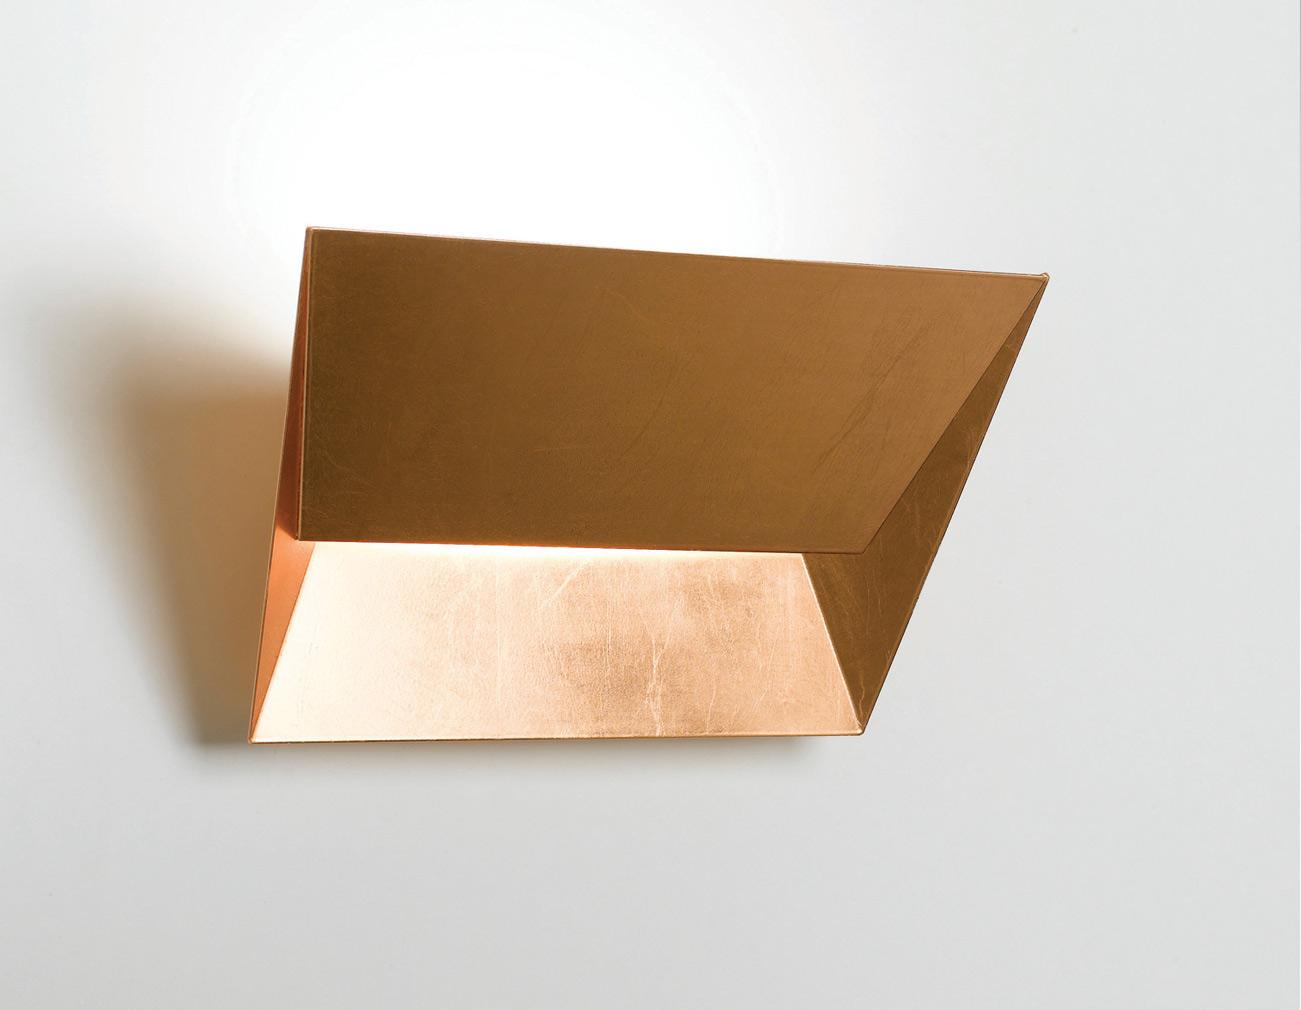 Mail, design by Valerio Sommella and Alberto Saggia for Lumen Center Italia, 2013.